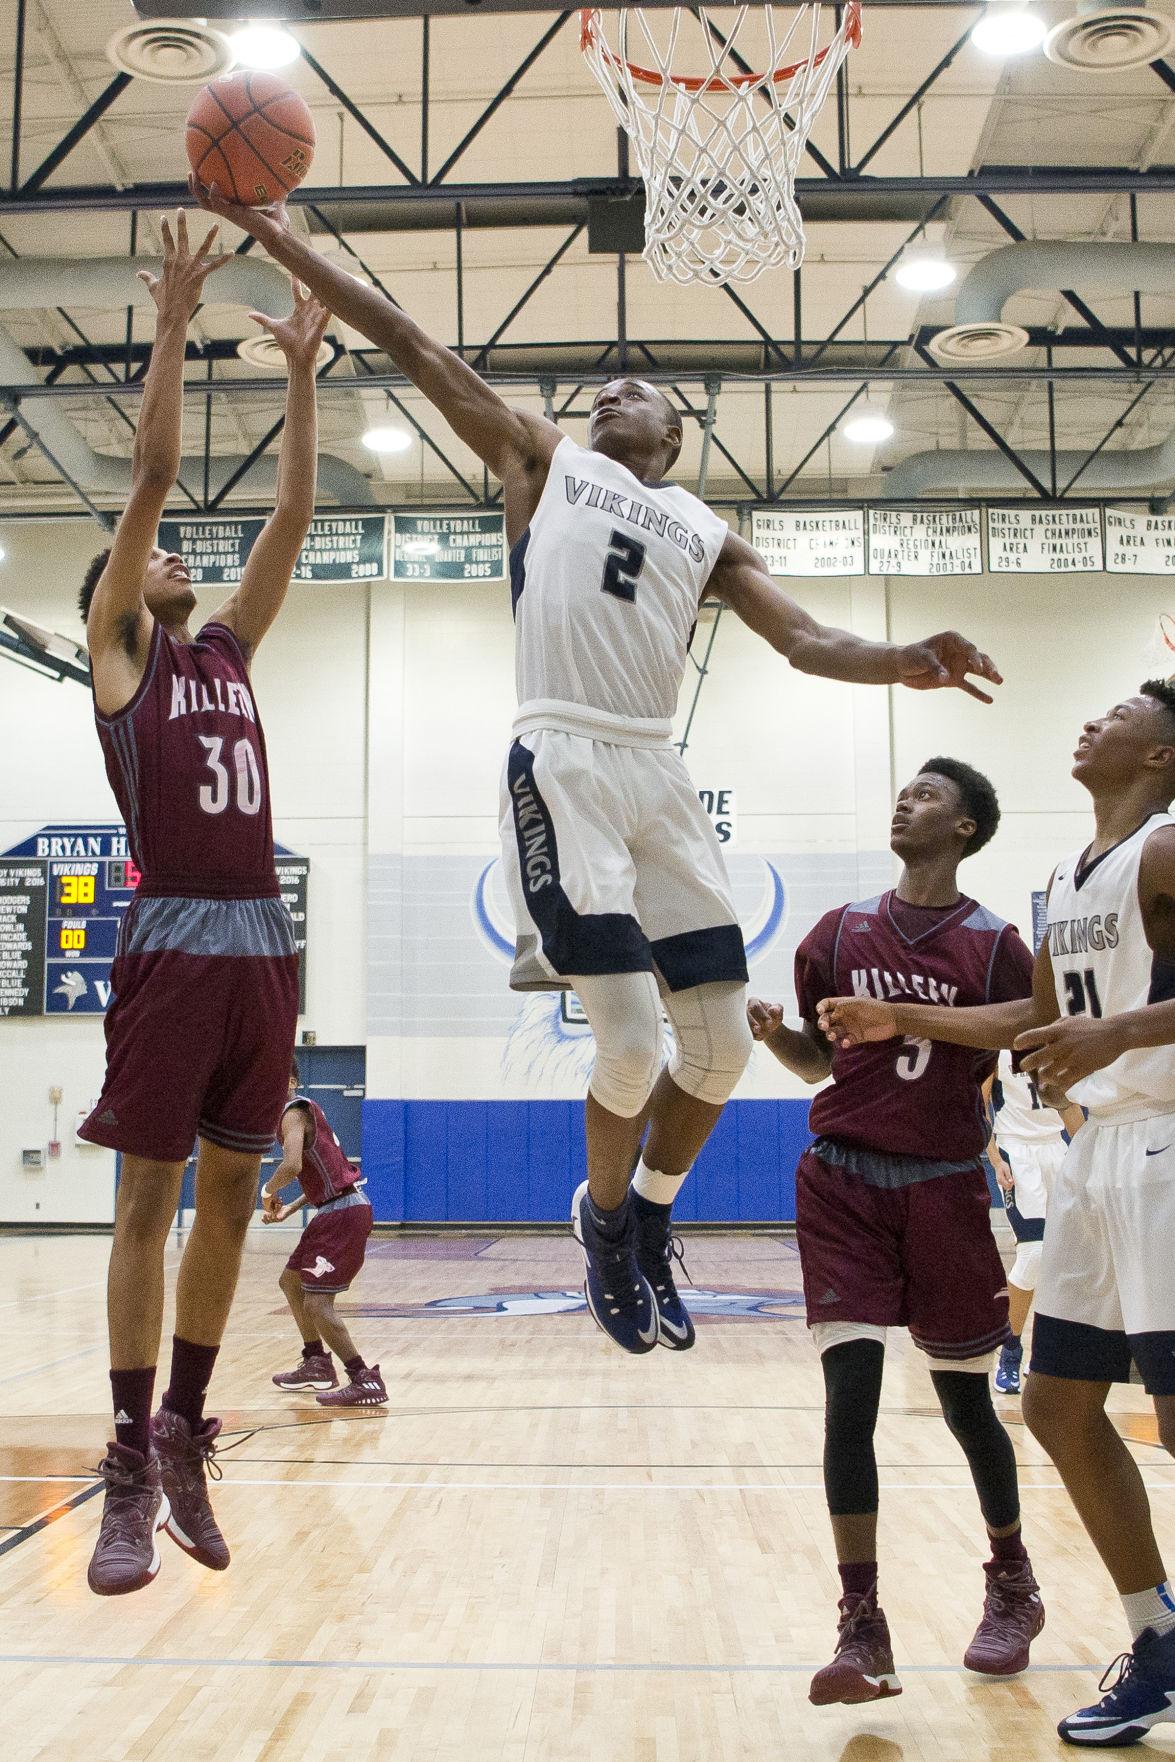 Bryan boys basketball team nipped by Killeen 71-66 | Basketball